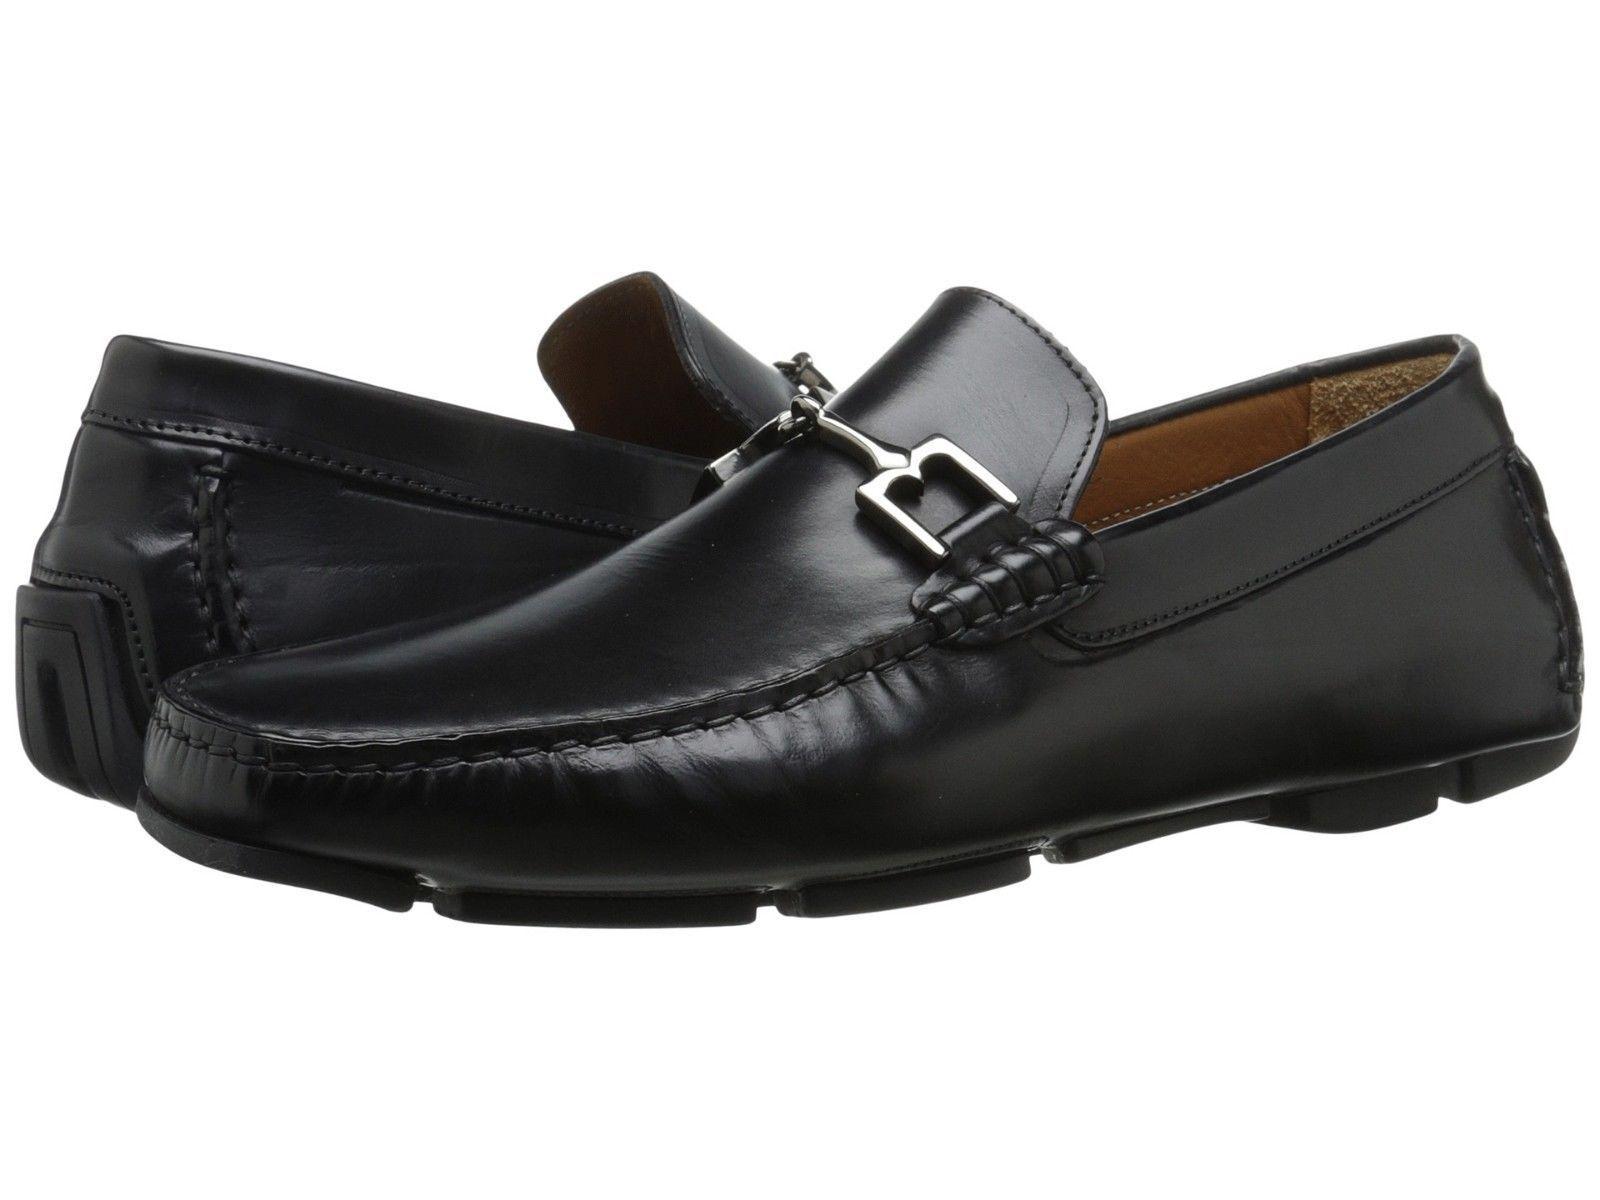 di moda Bruno Magli Uomo Monza nero Leather Bit Bit Bit Handmade Italian Loafer Dress Shoe  outlet